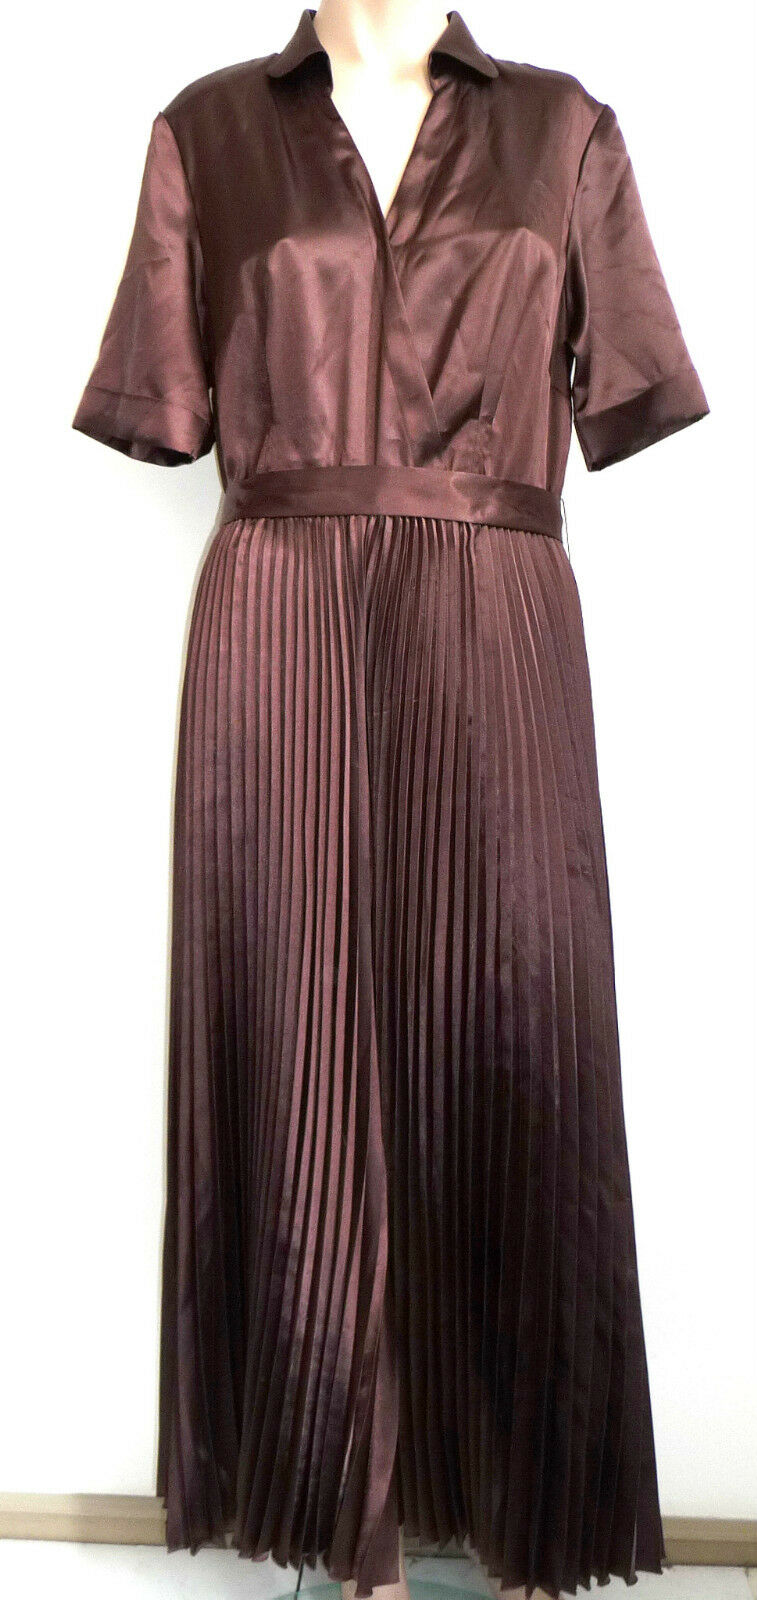 NEU Madeleine Gr. 42 Langes Kleid braun Plissee Plisseekleid Lange Kleid